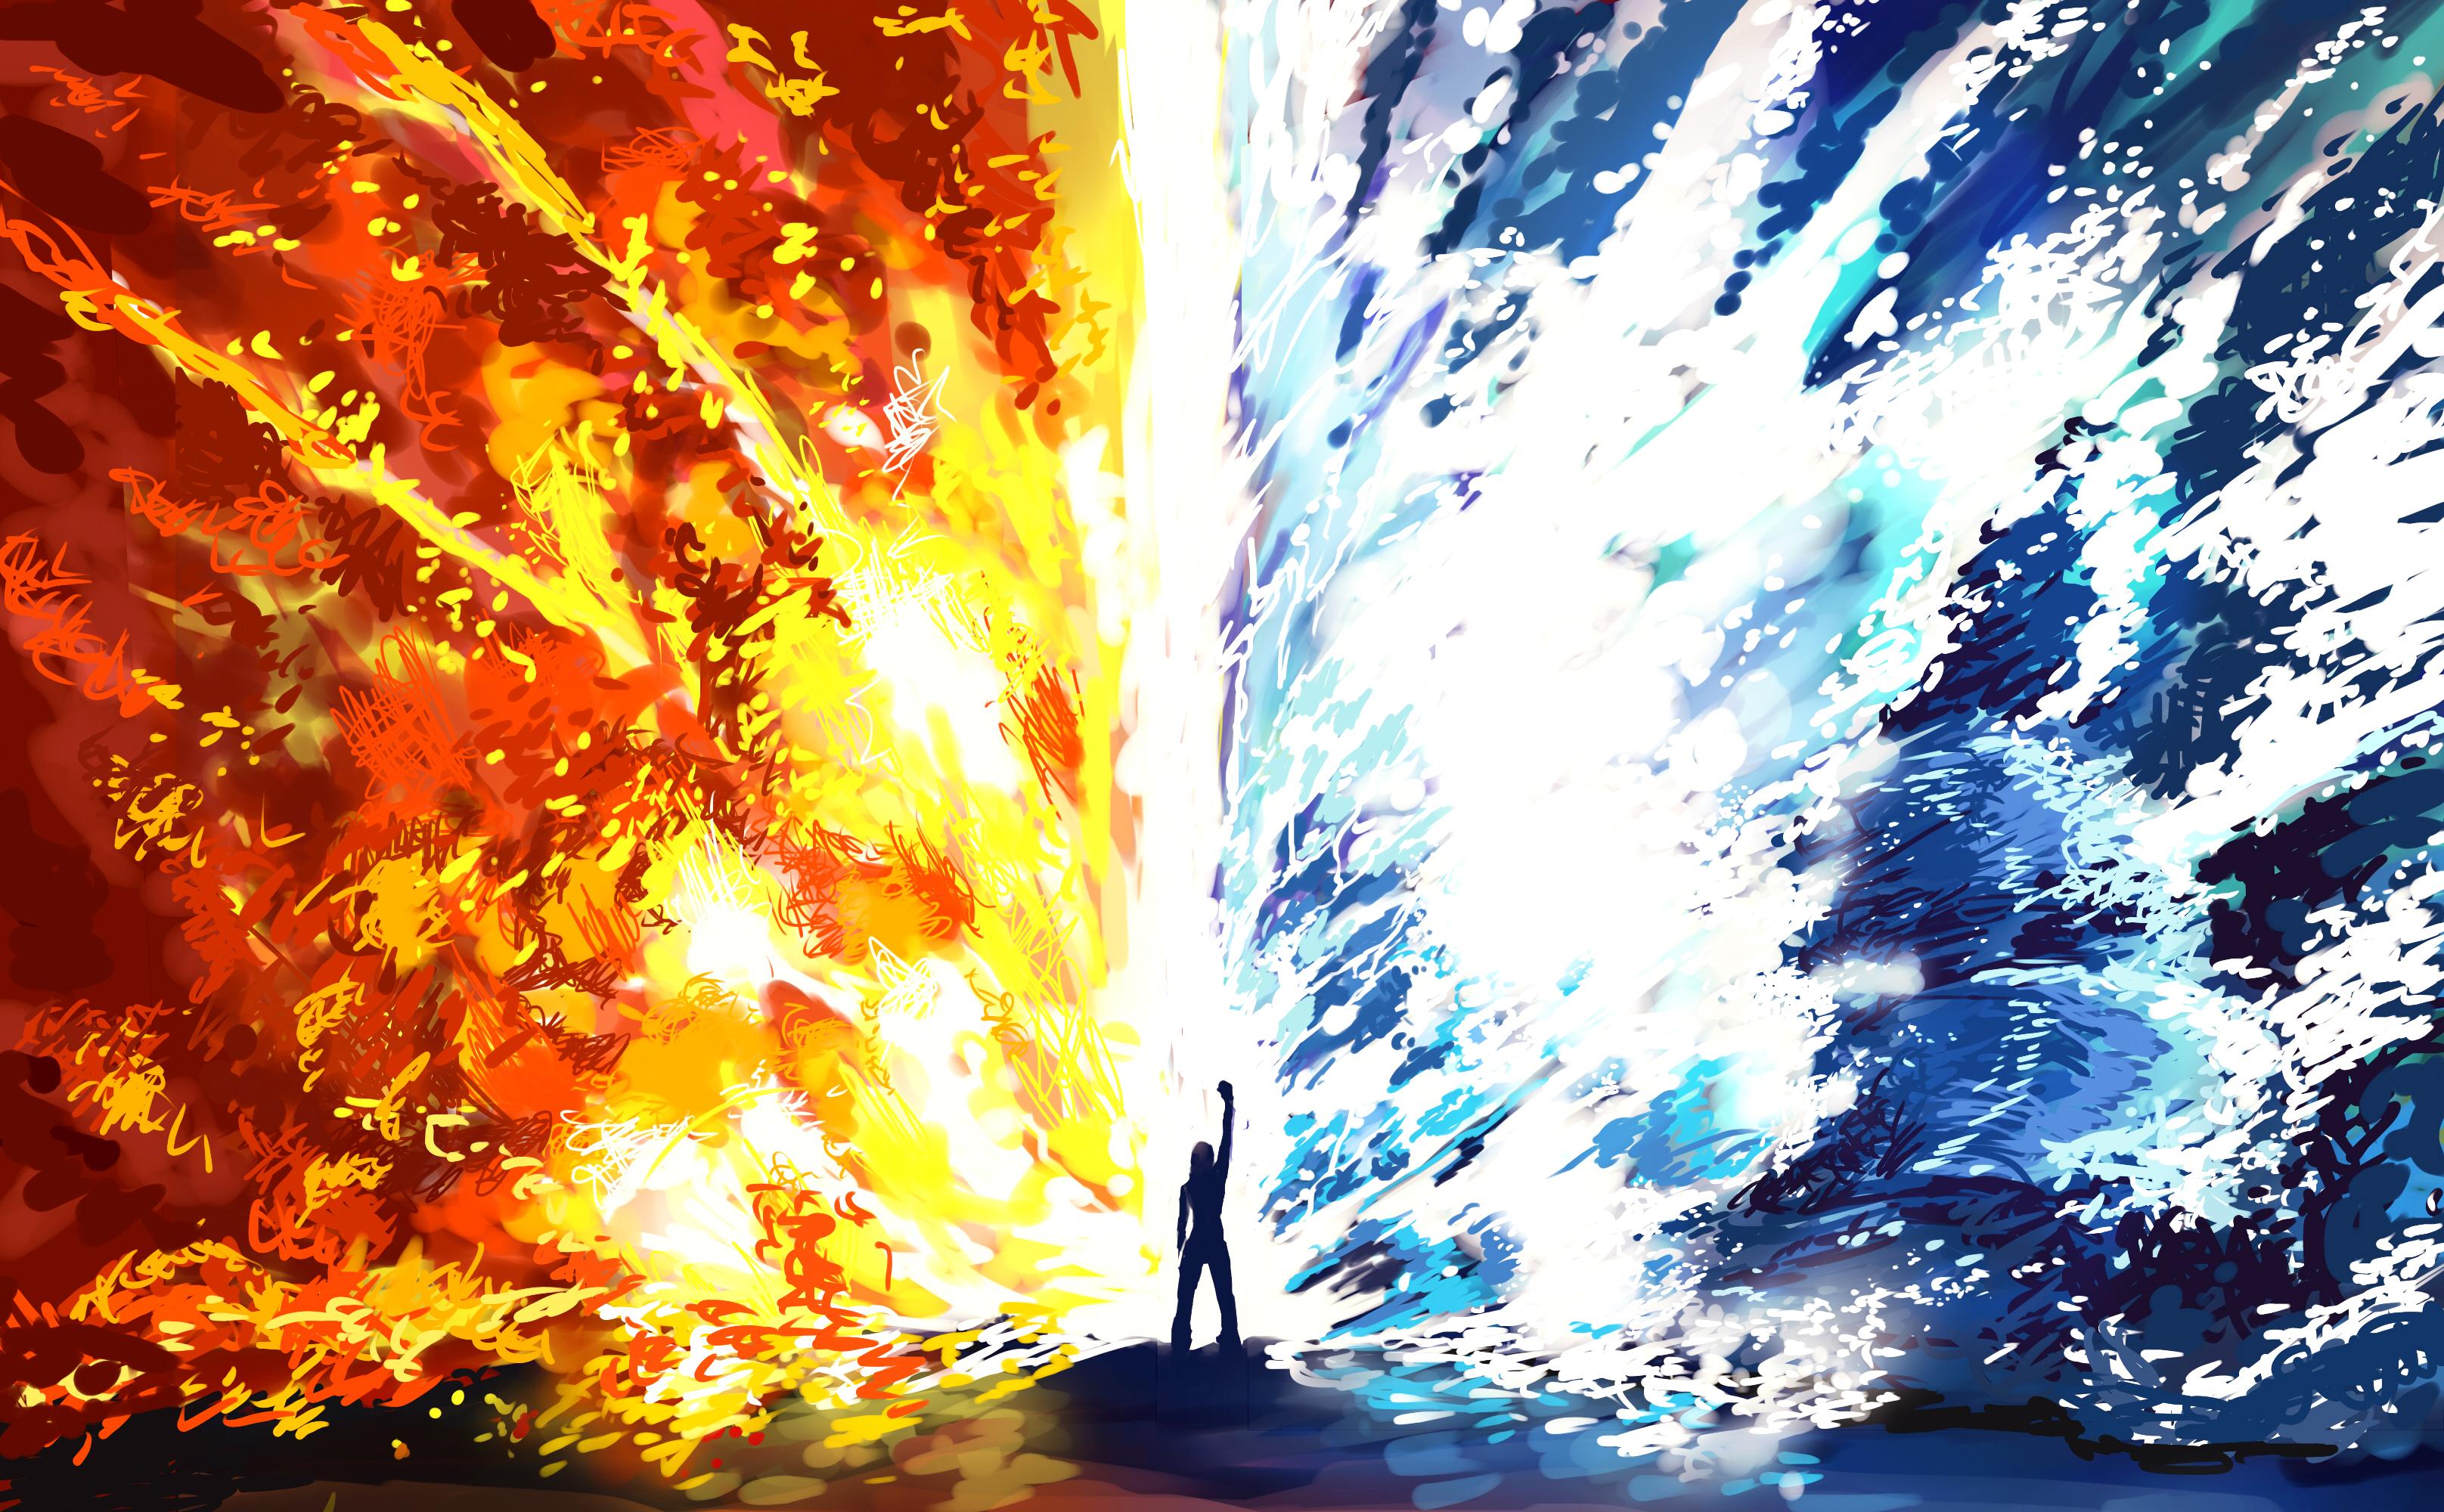 Elemental Fire Girl Magic Water Woman 3232x2000